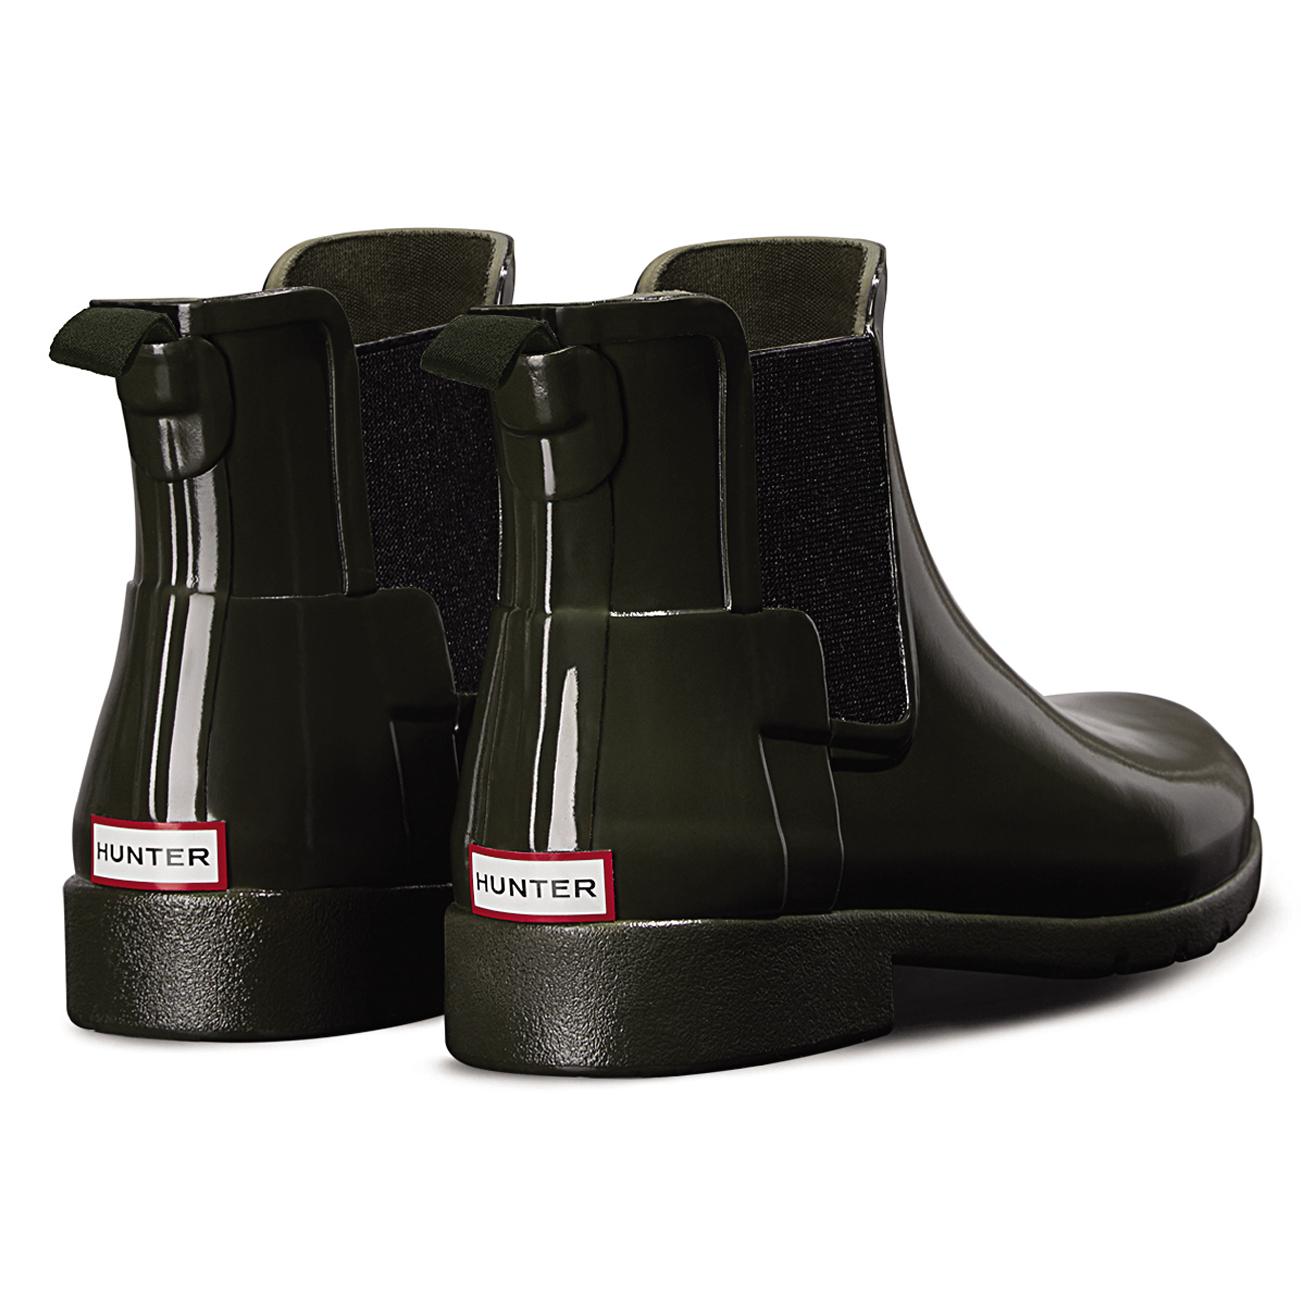 Damenschuhe Hunter Original Refined Chelsea Gloss Waterproof 3-9 Wellie Ankle Boot UK 3-9 Waterproof 318fa2